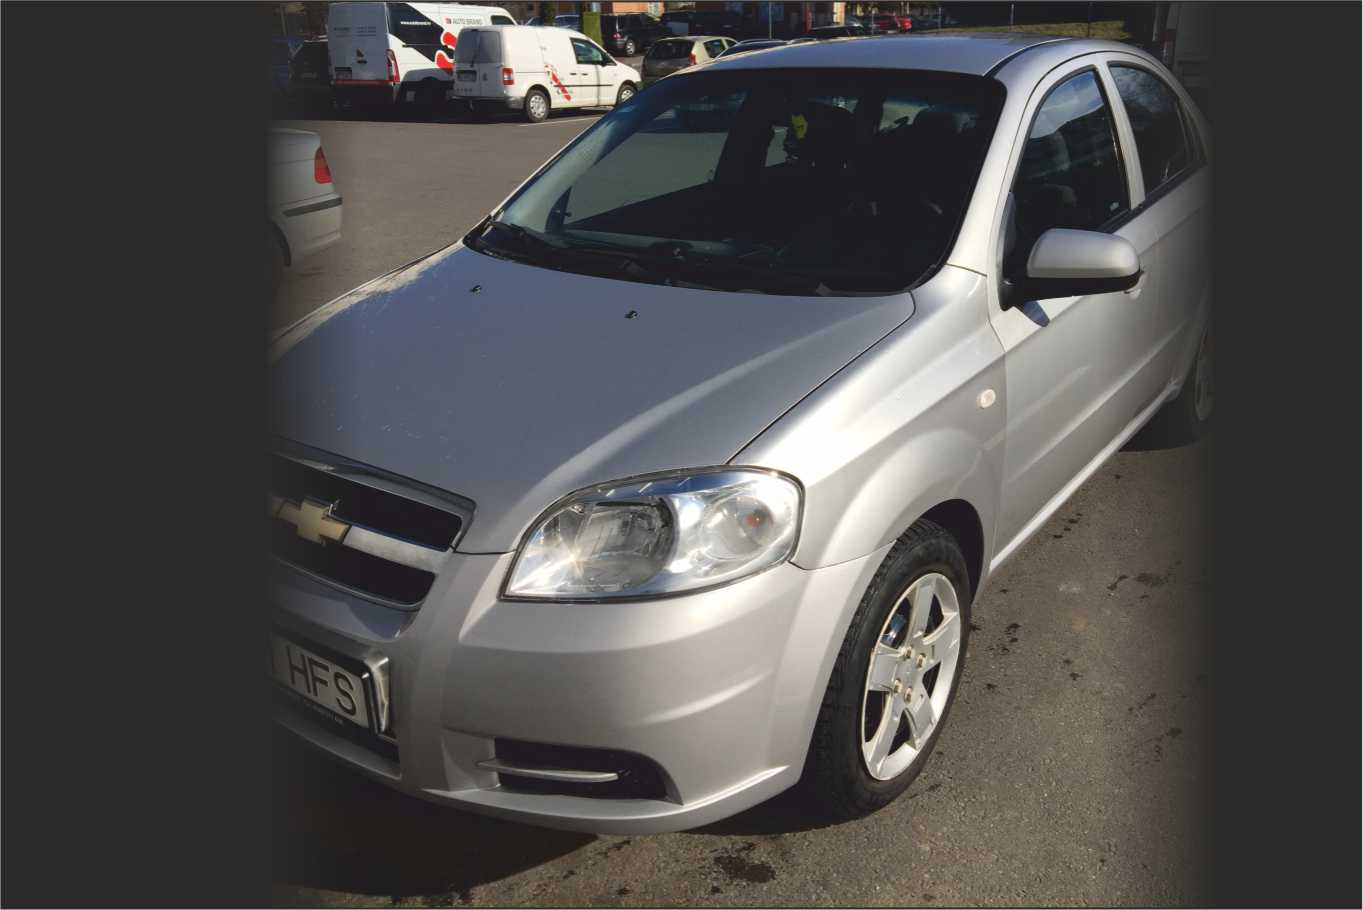 Chevrolet Aveo - Atlas Car Rental